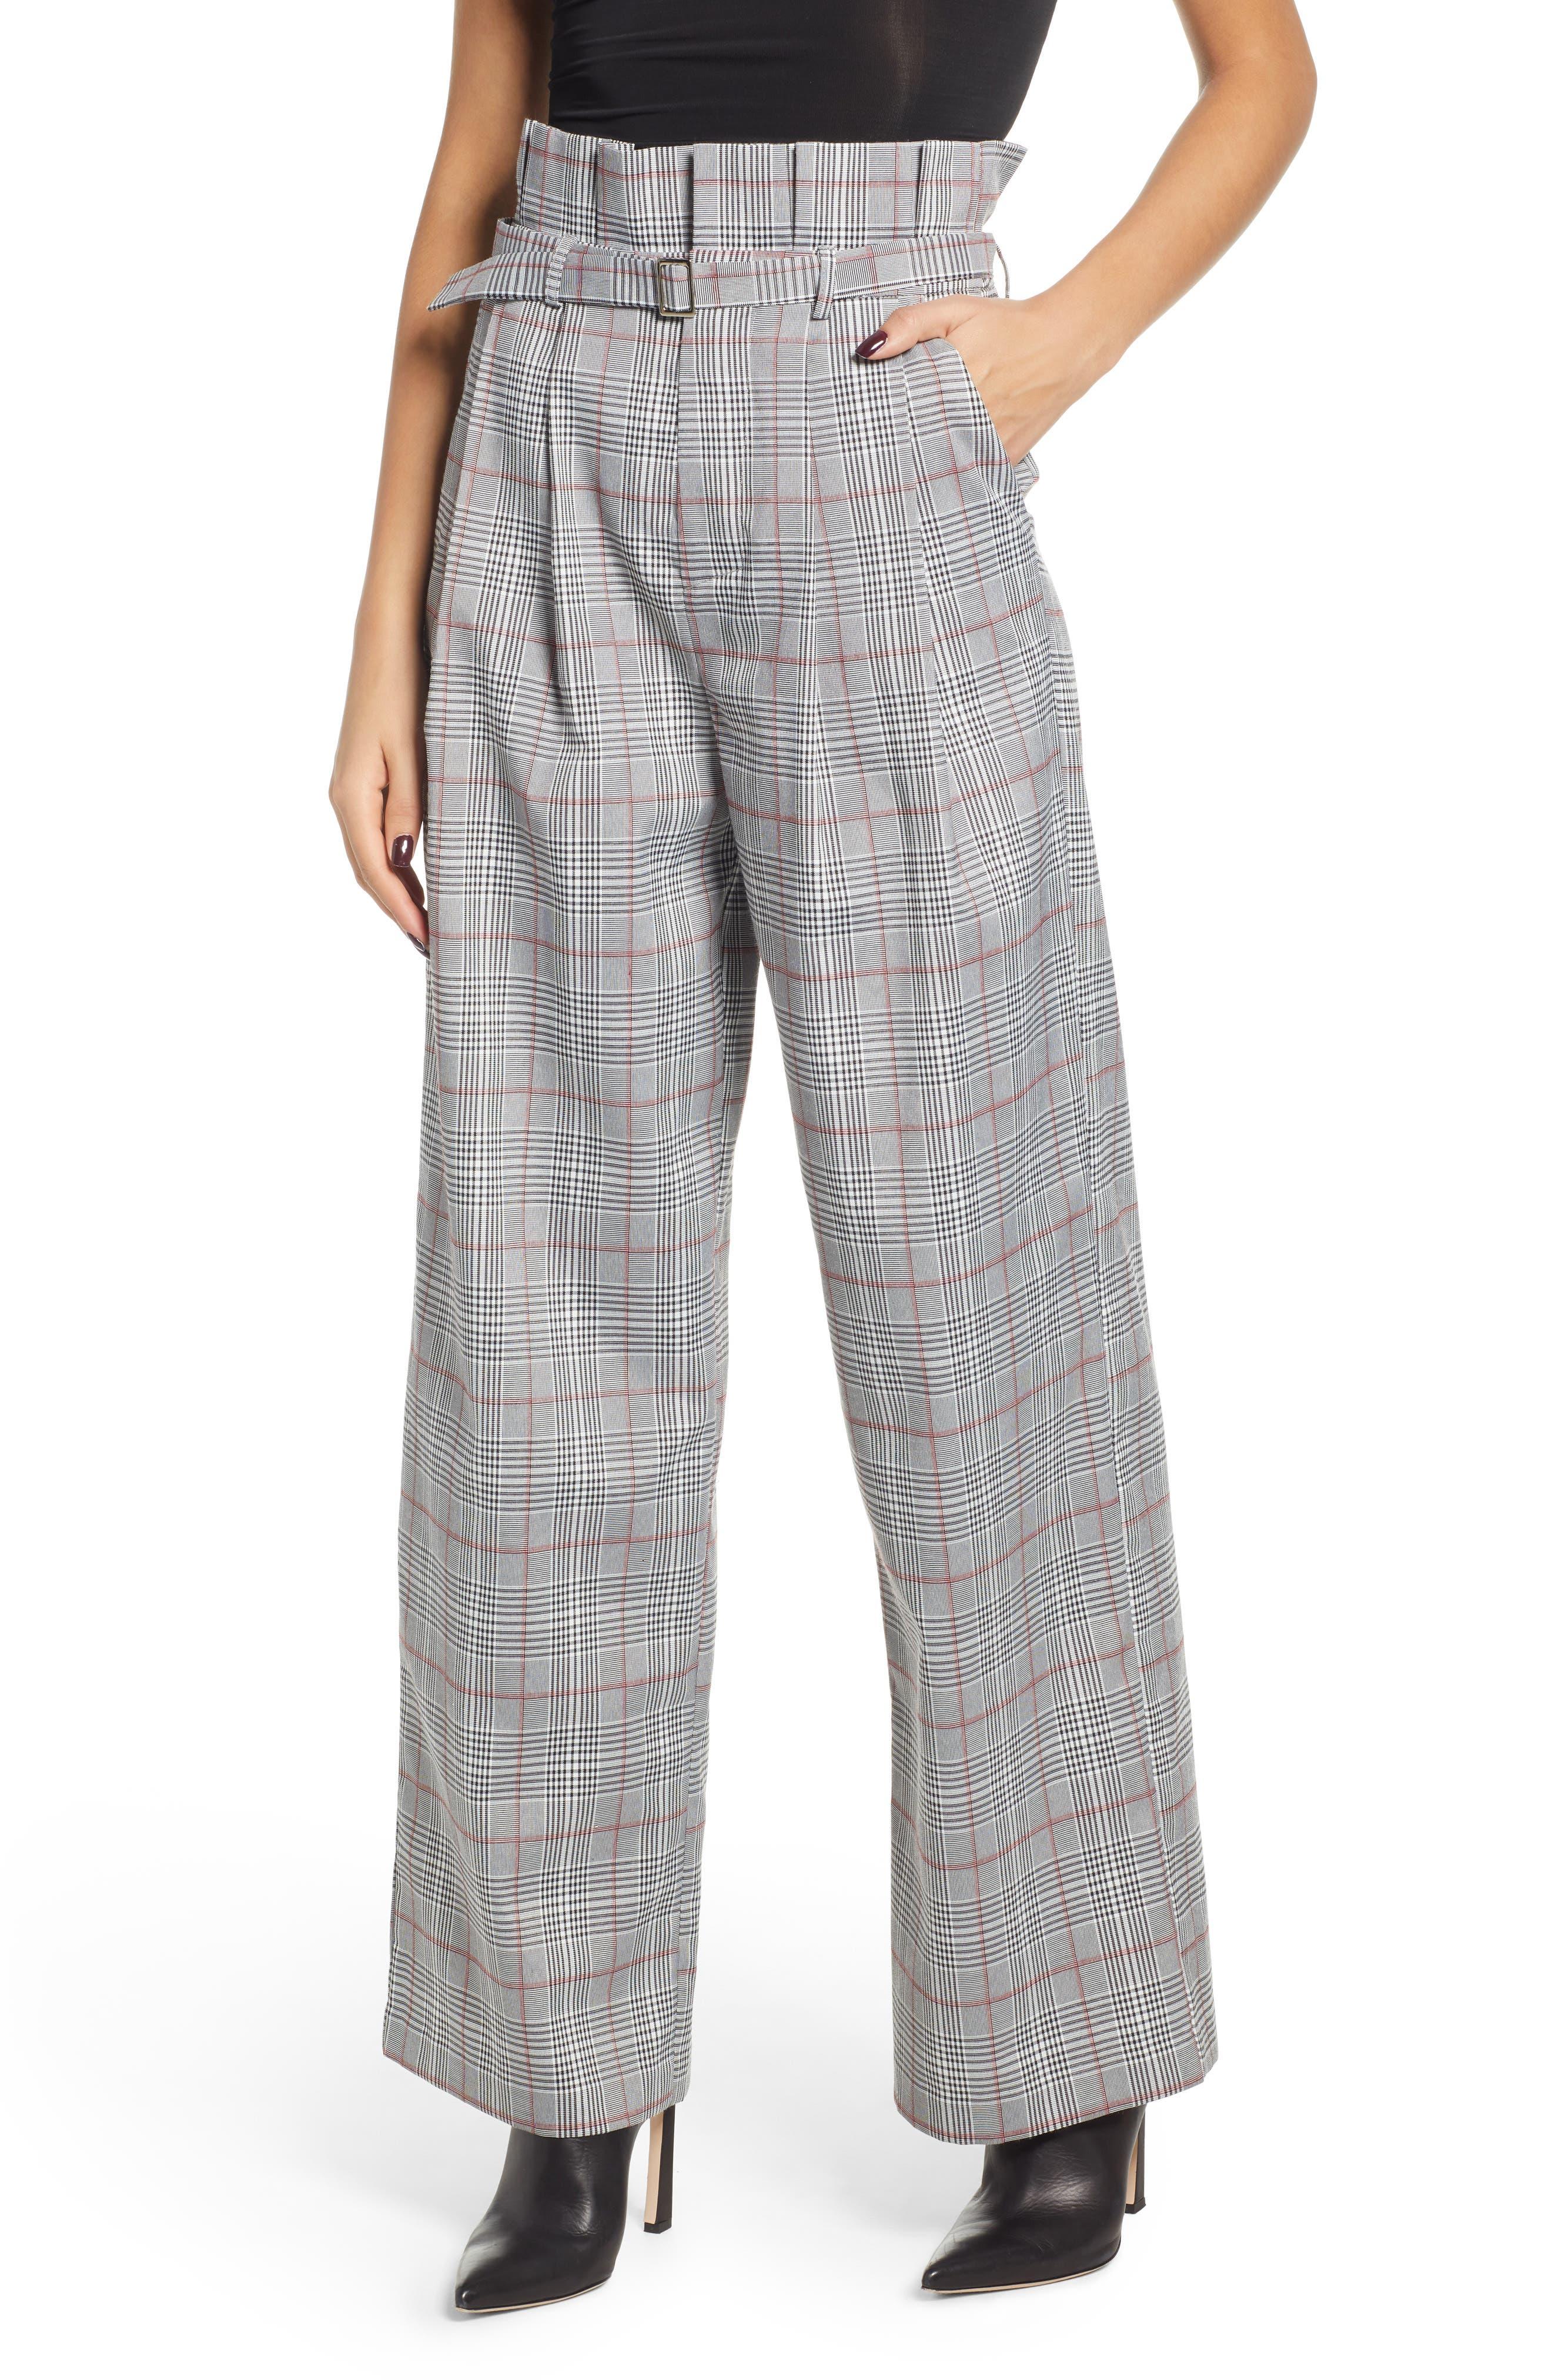 ENGLISH FACTORY High Waist Plaid Pants, Main, color, 020